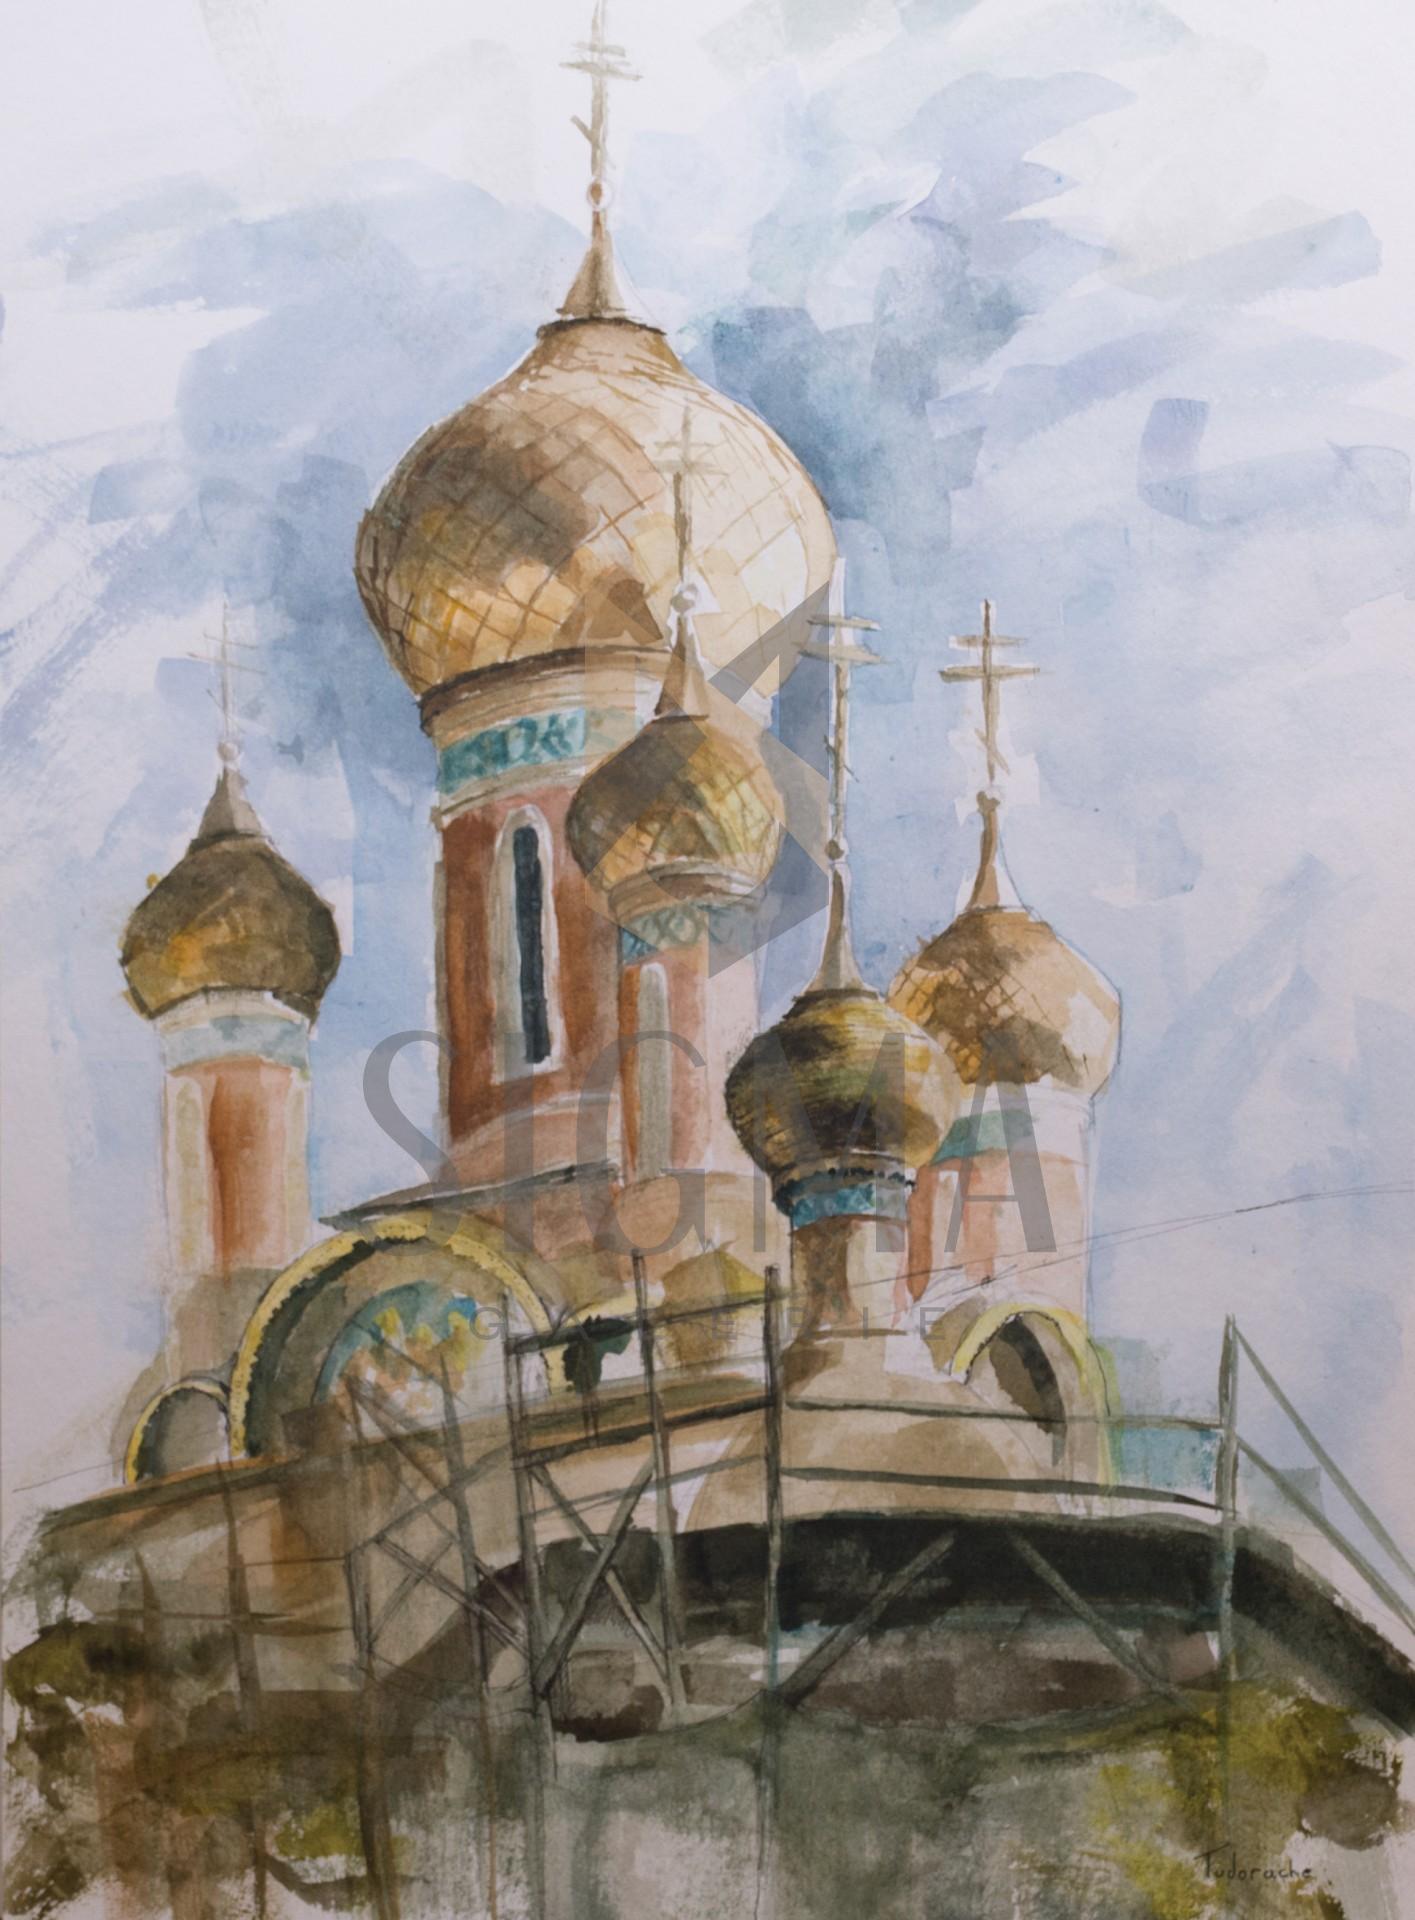 Tablou, George Daniel Tudorache, - Biserica Rusa - acuarela si tus, 42x30 cm